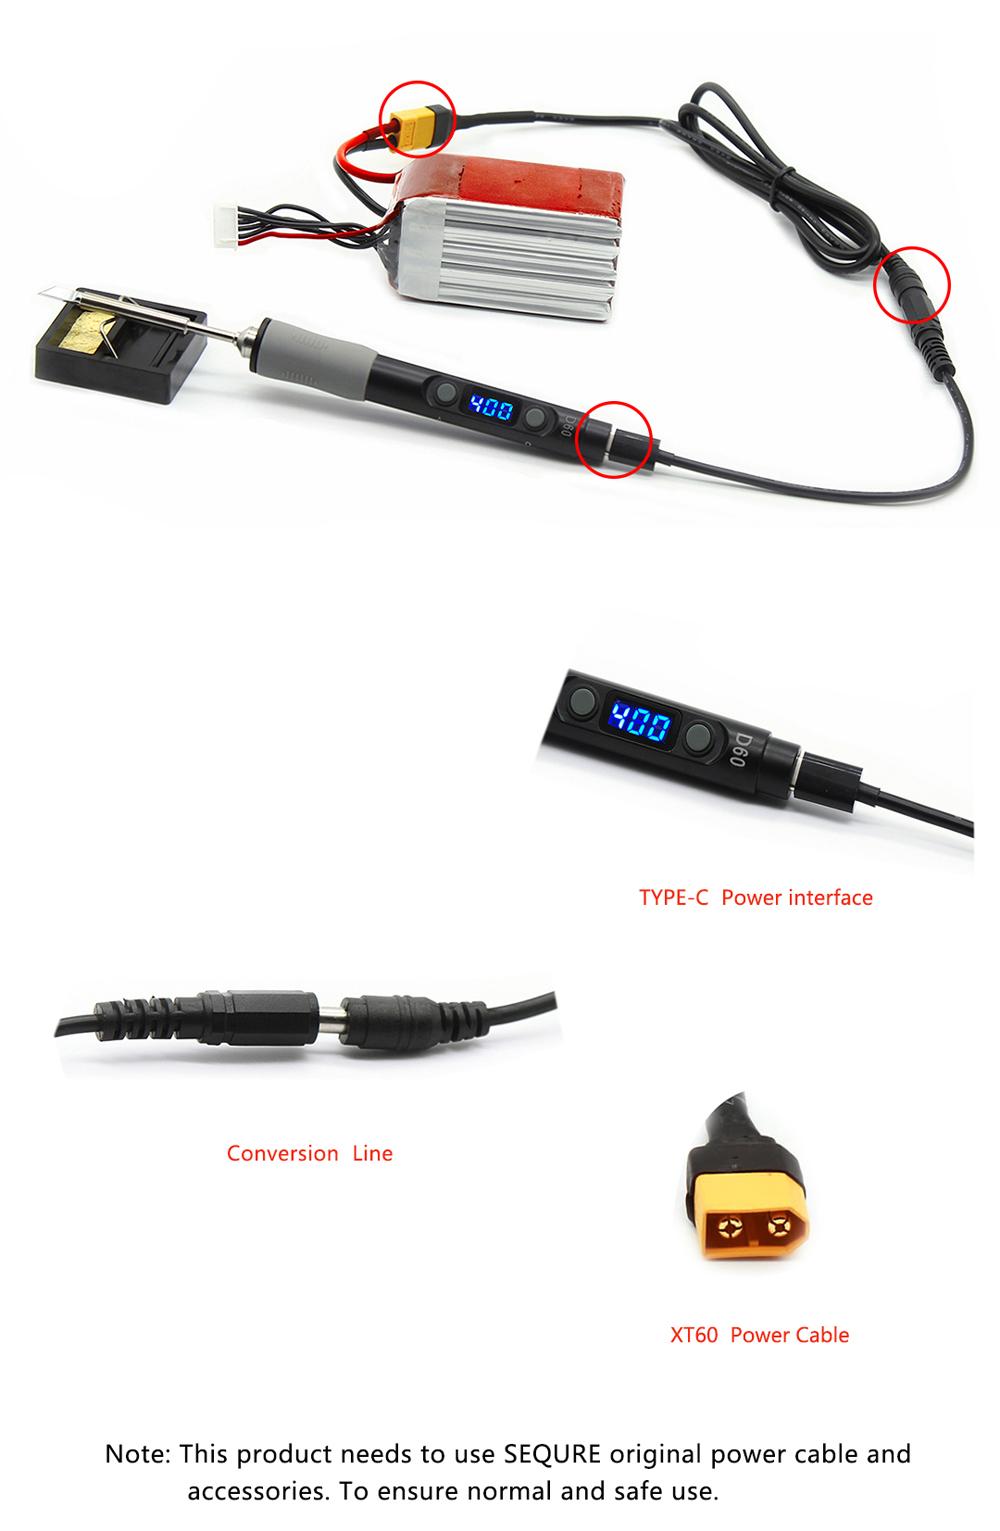 Sq-d60 60w digital soldering iron station dc12-24v type-c